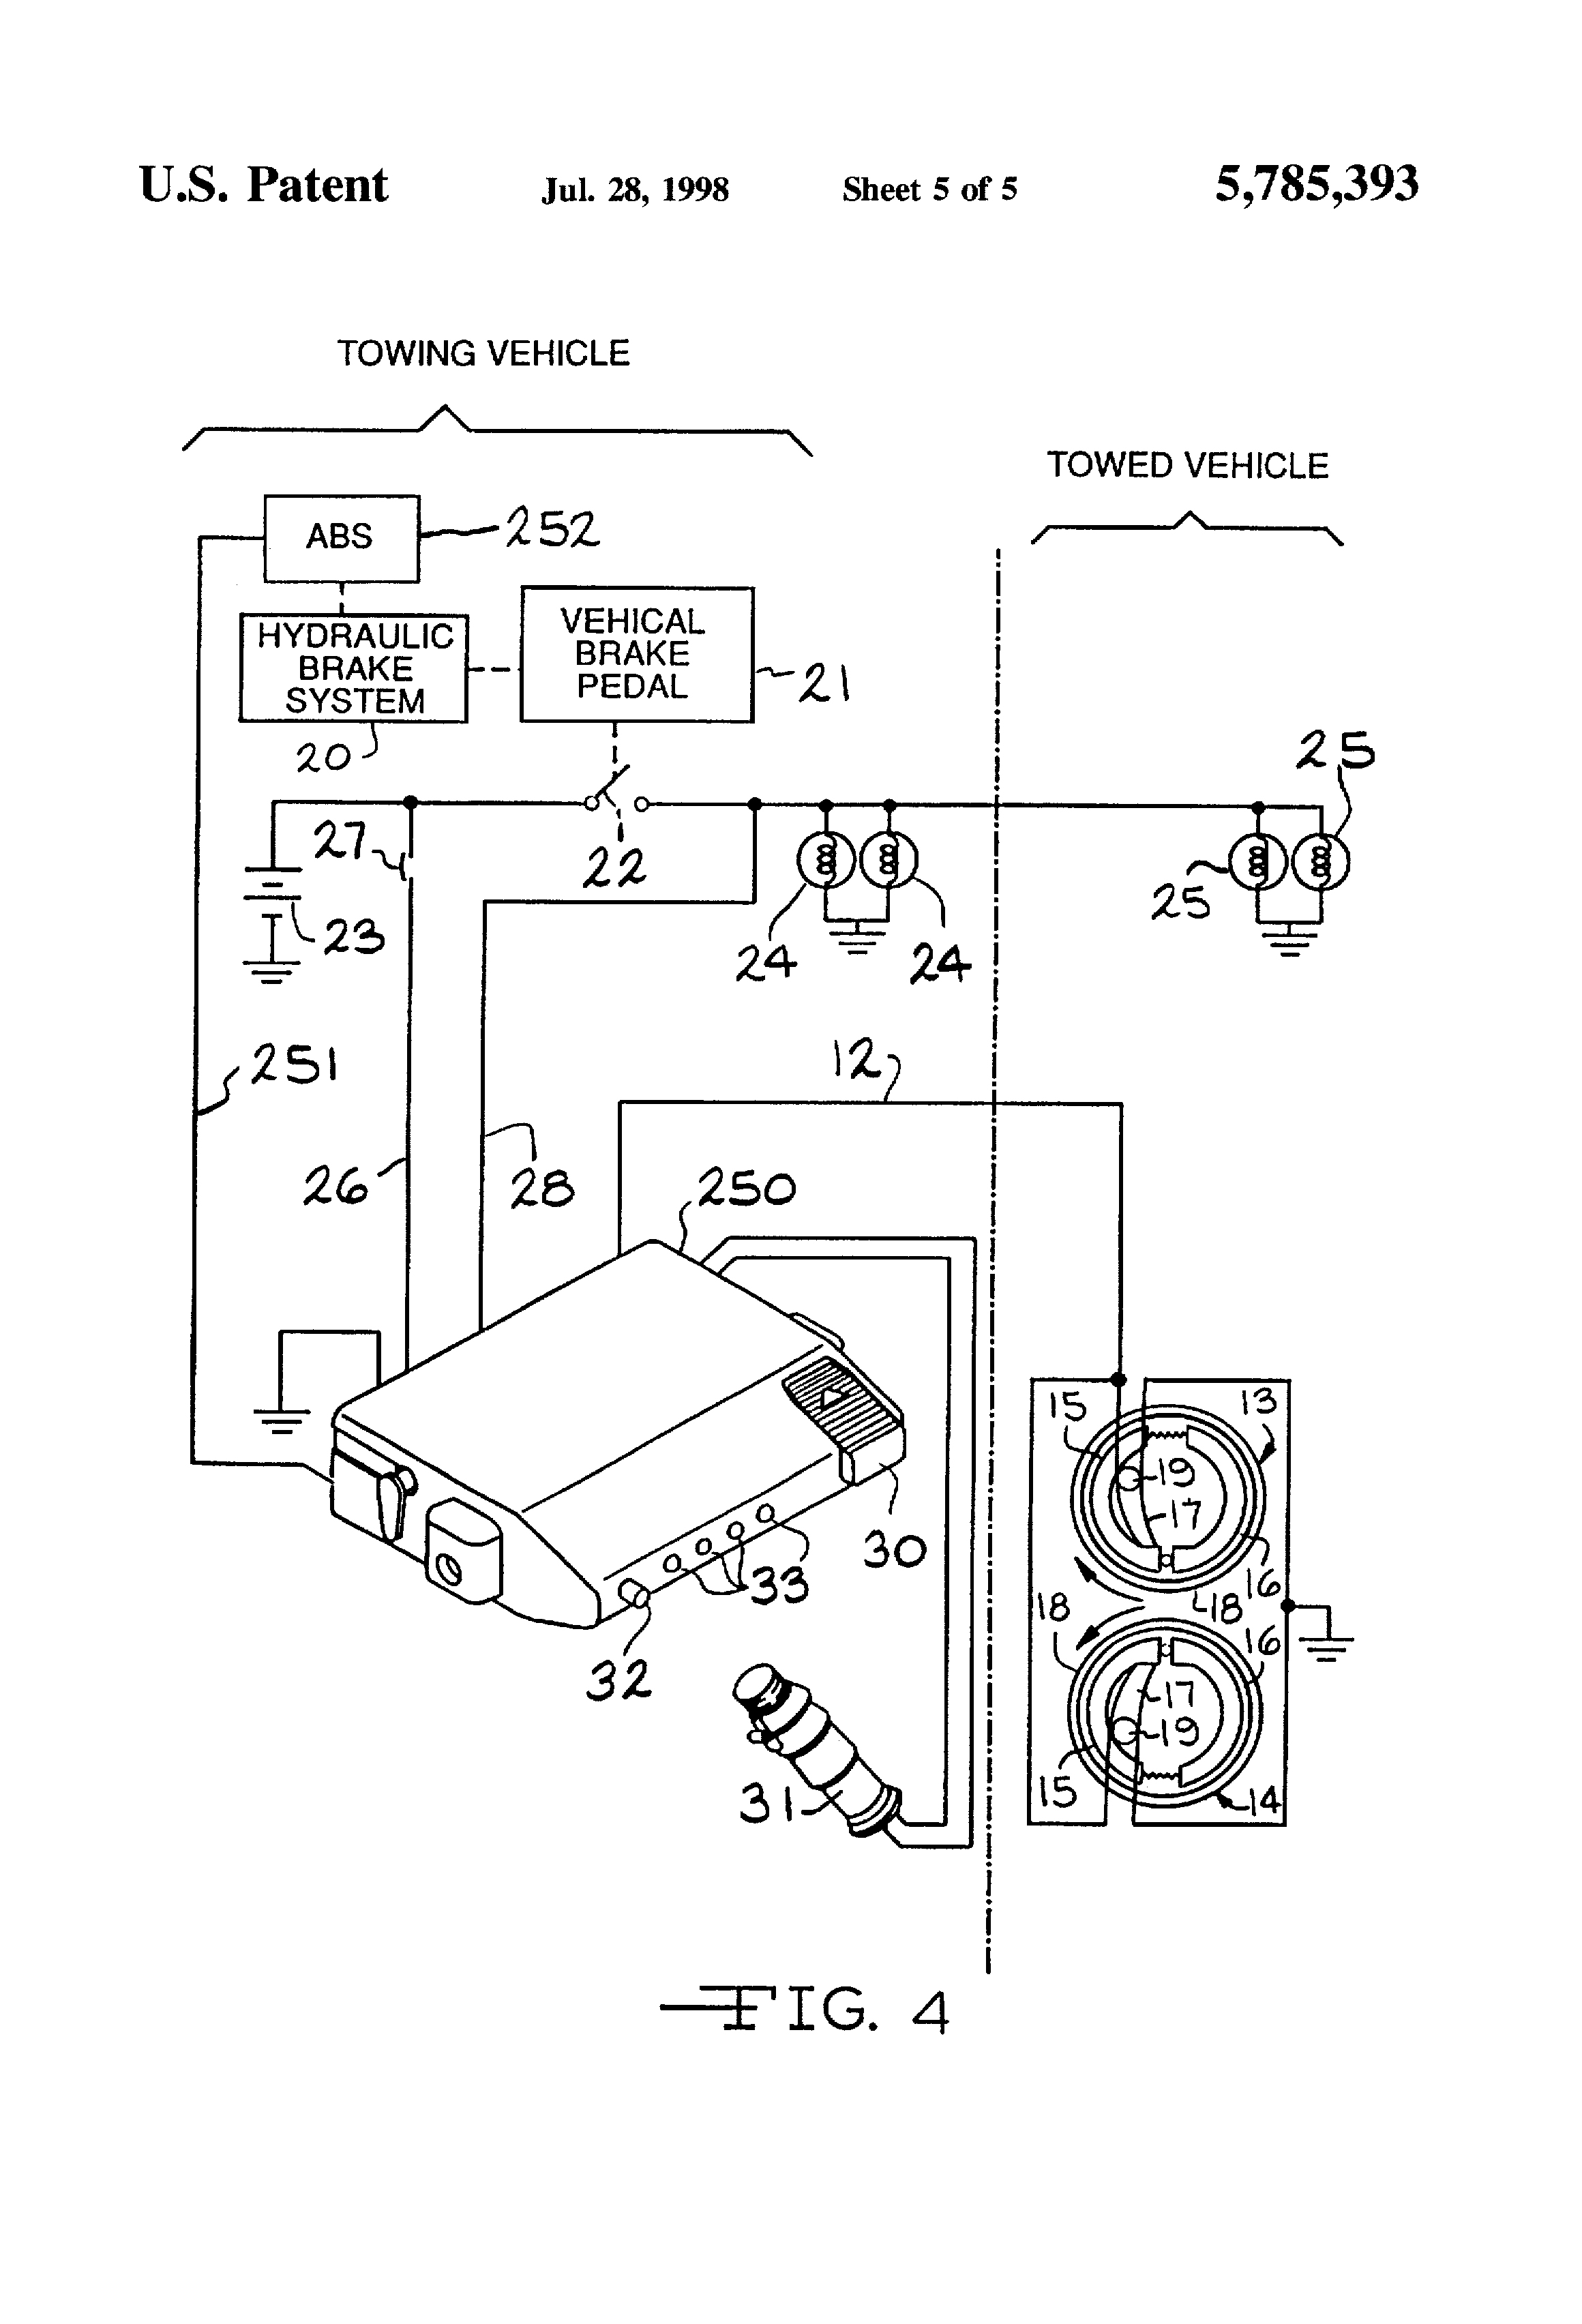 Ford Trailer Brake Control Wiring Diagram | Wiring Diagram - Ford Trailer Brake Controller Wiring Diagram